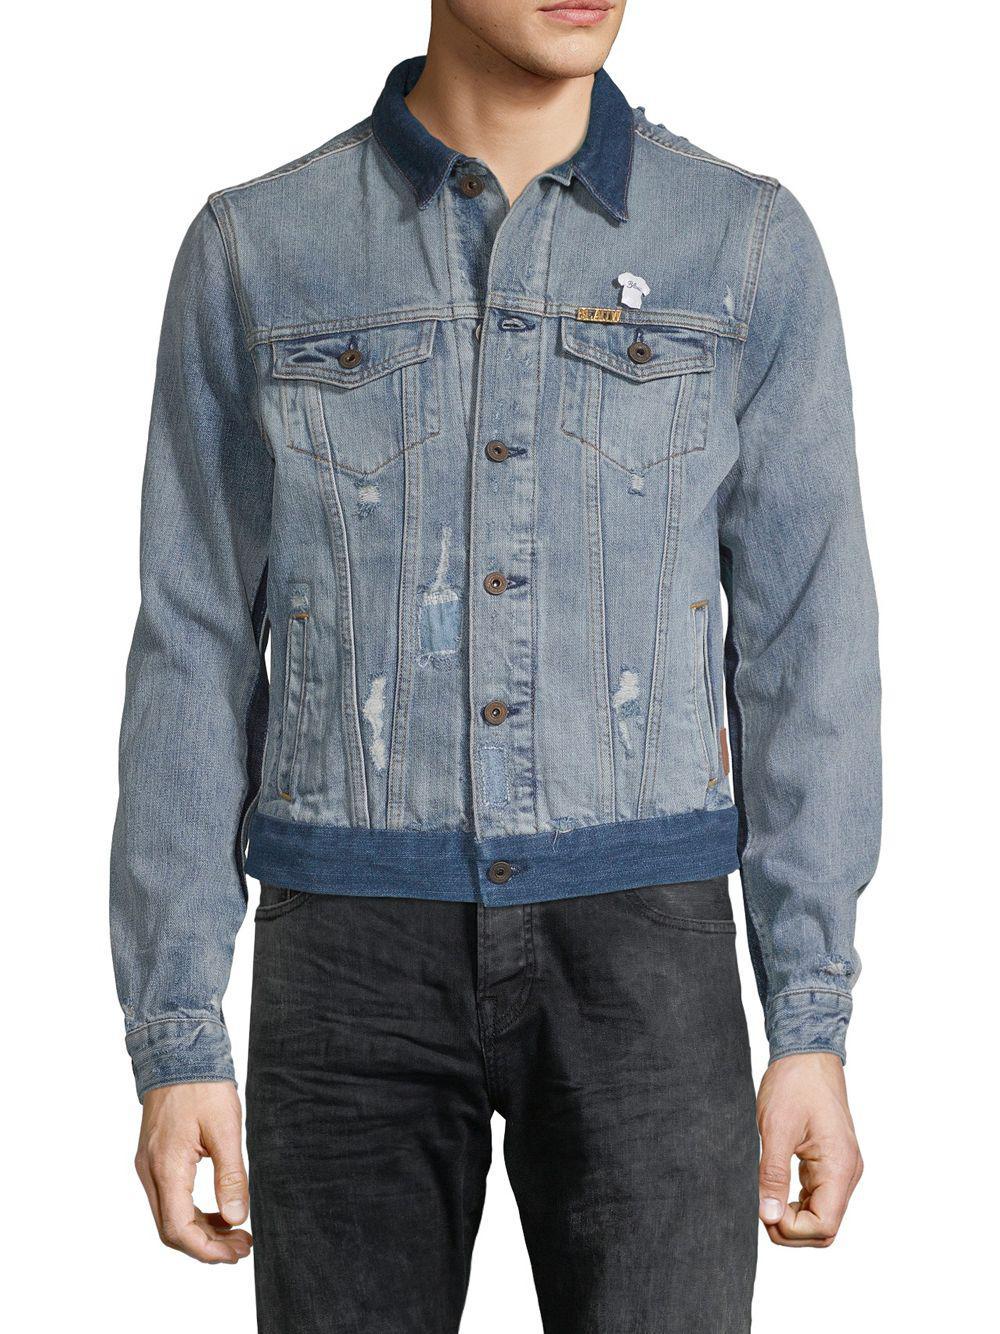 343440003e0 Lyst - Scotch   Soda Heroes Customized Denim Jacket in Blue for Men